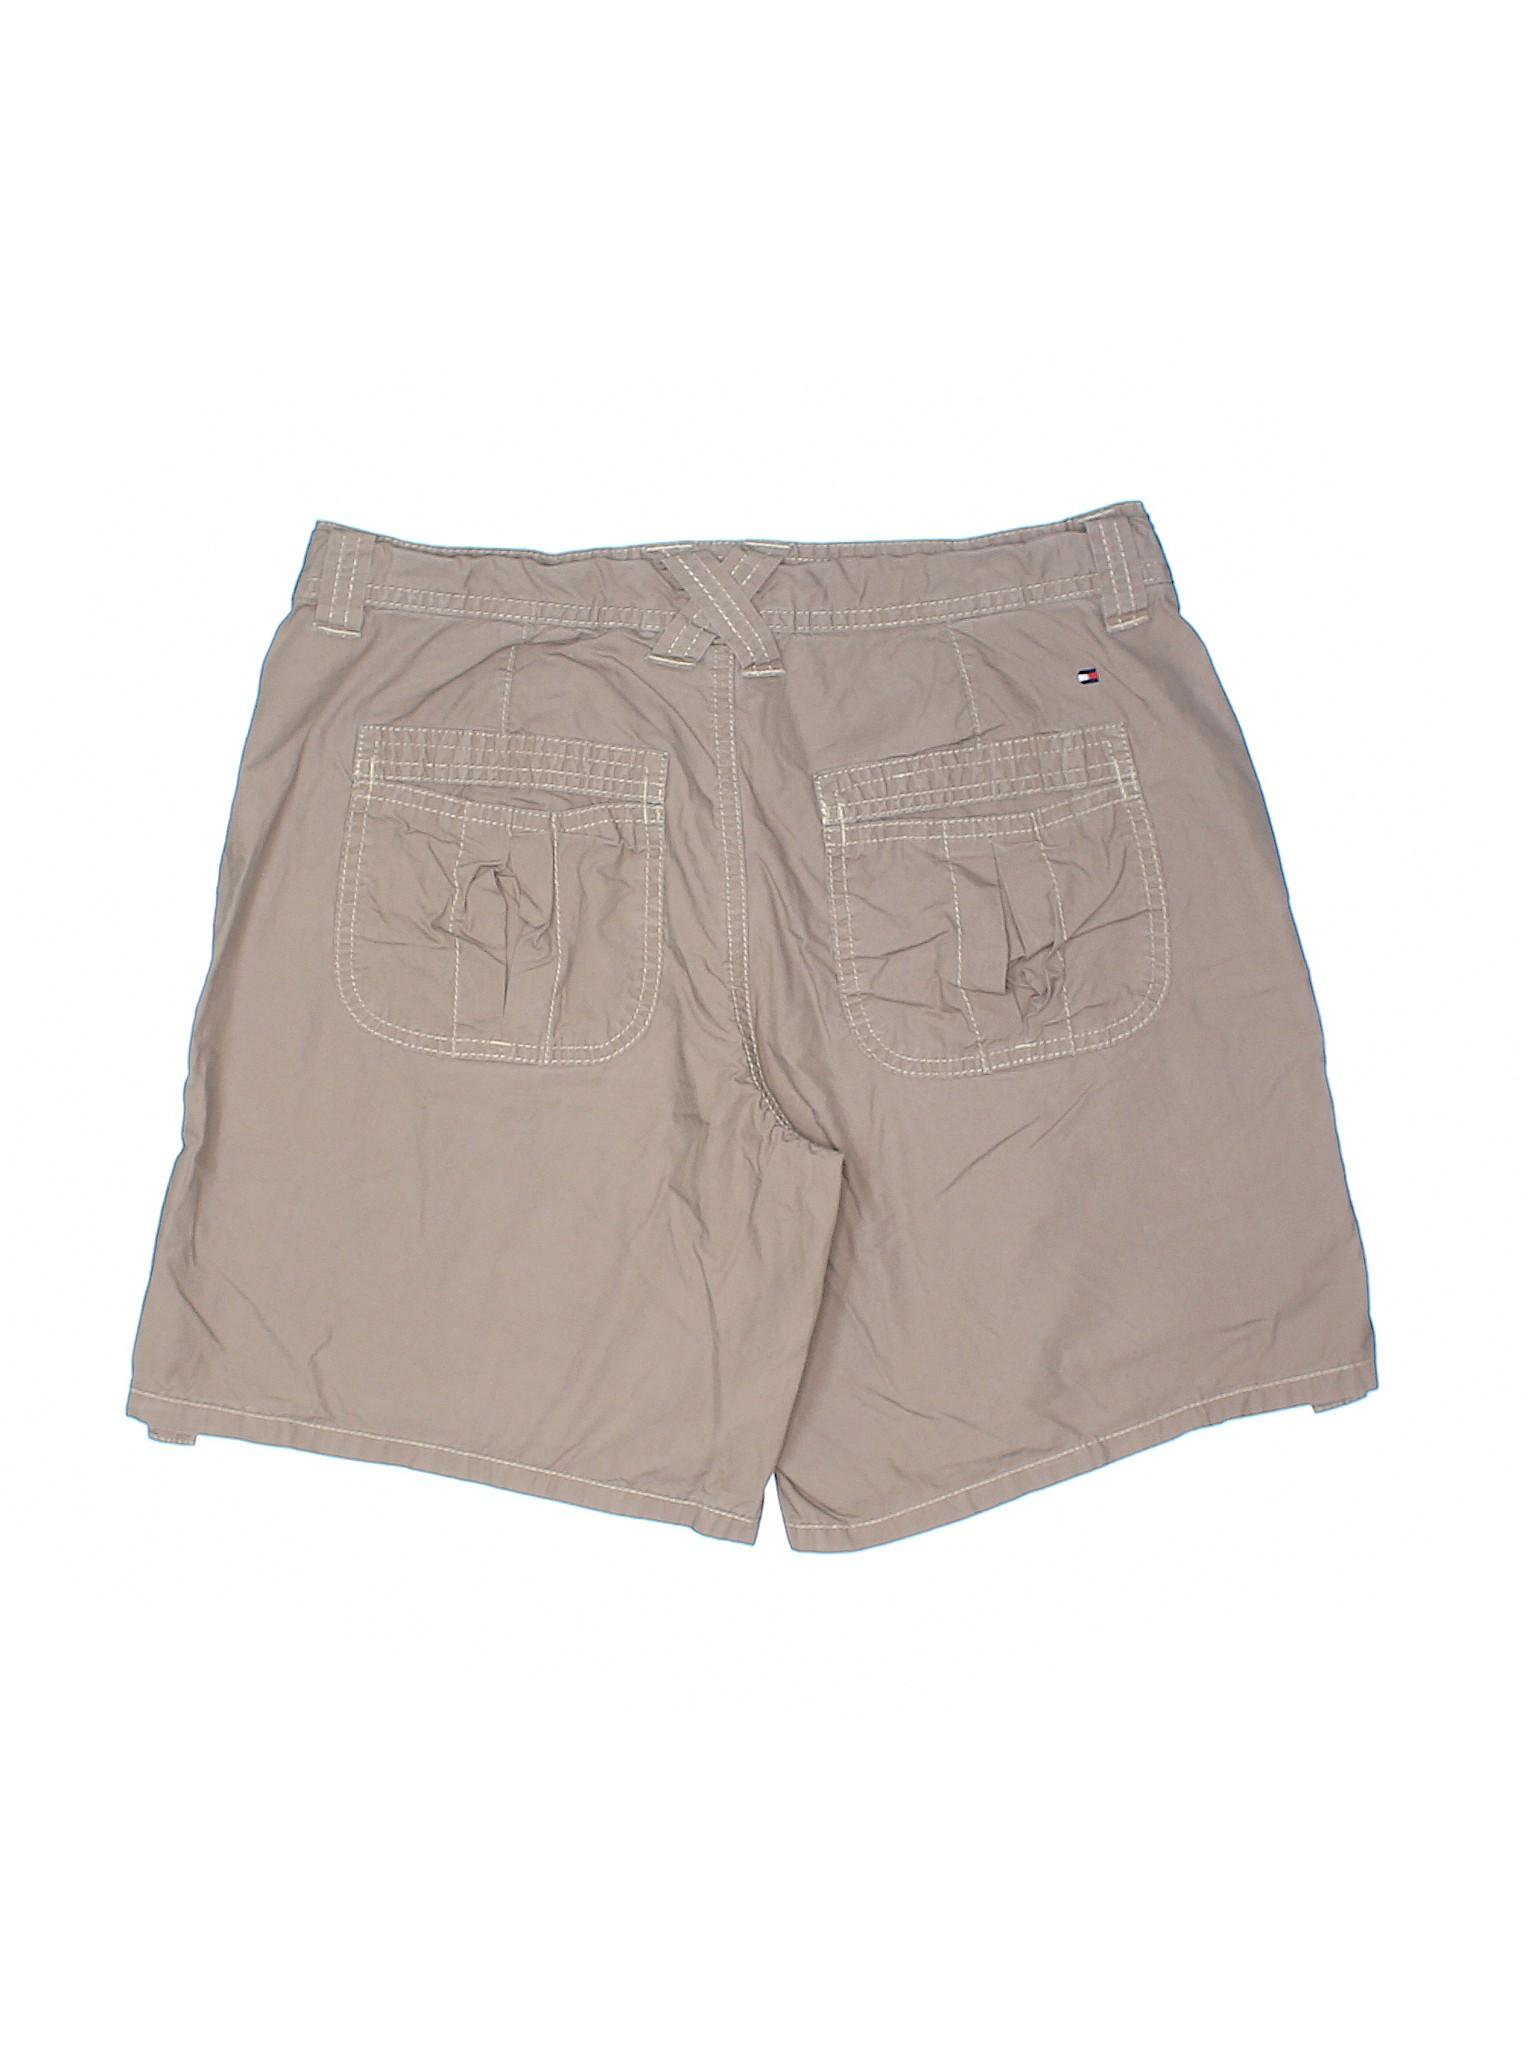 winter Shorts Tommy Leisure winter Hilfiger Tommy Shorts Hilfiger Leisure UP7n4xtF